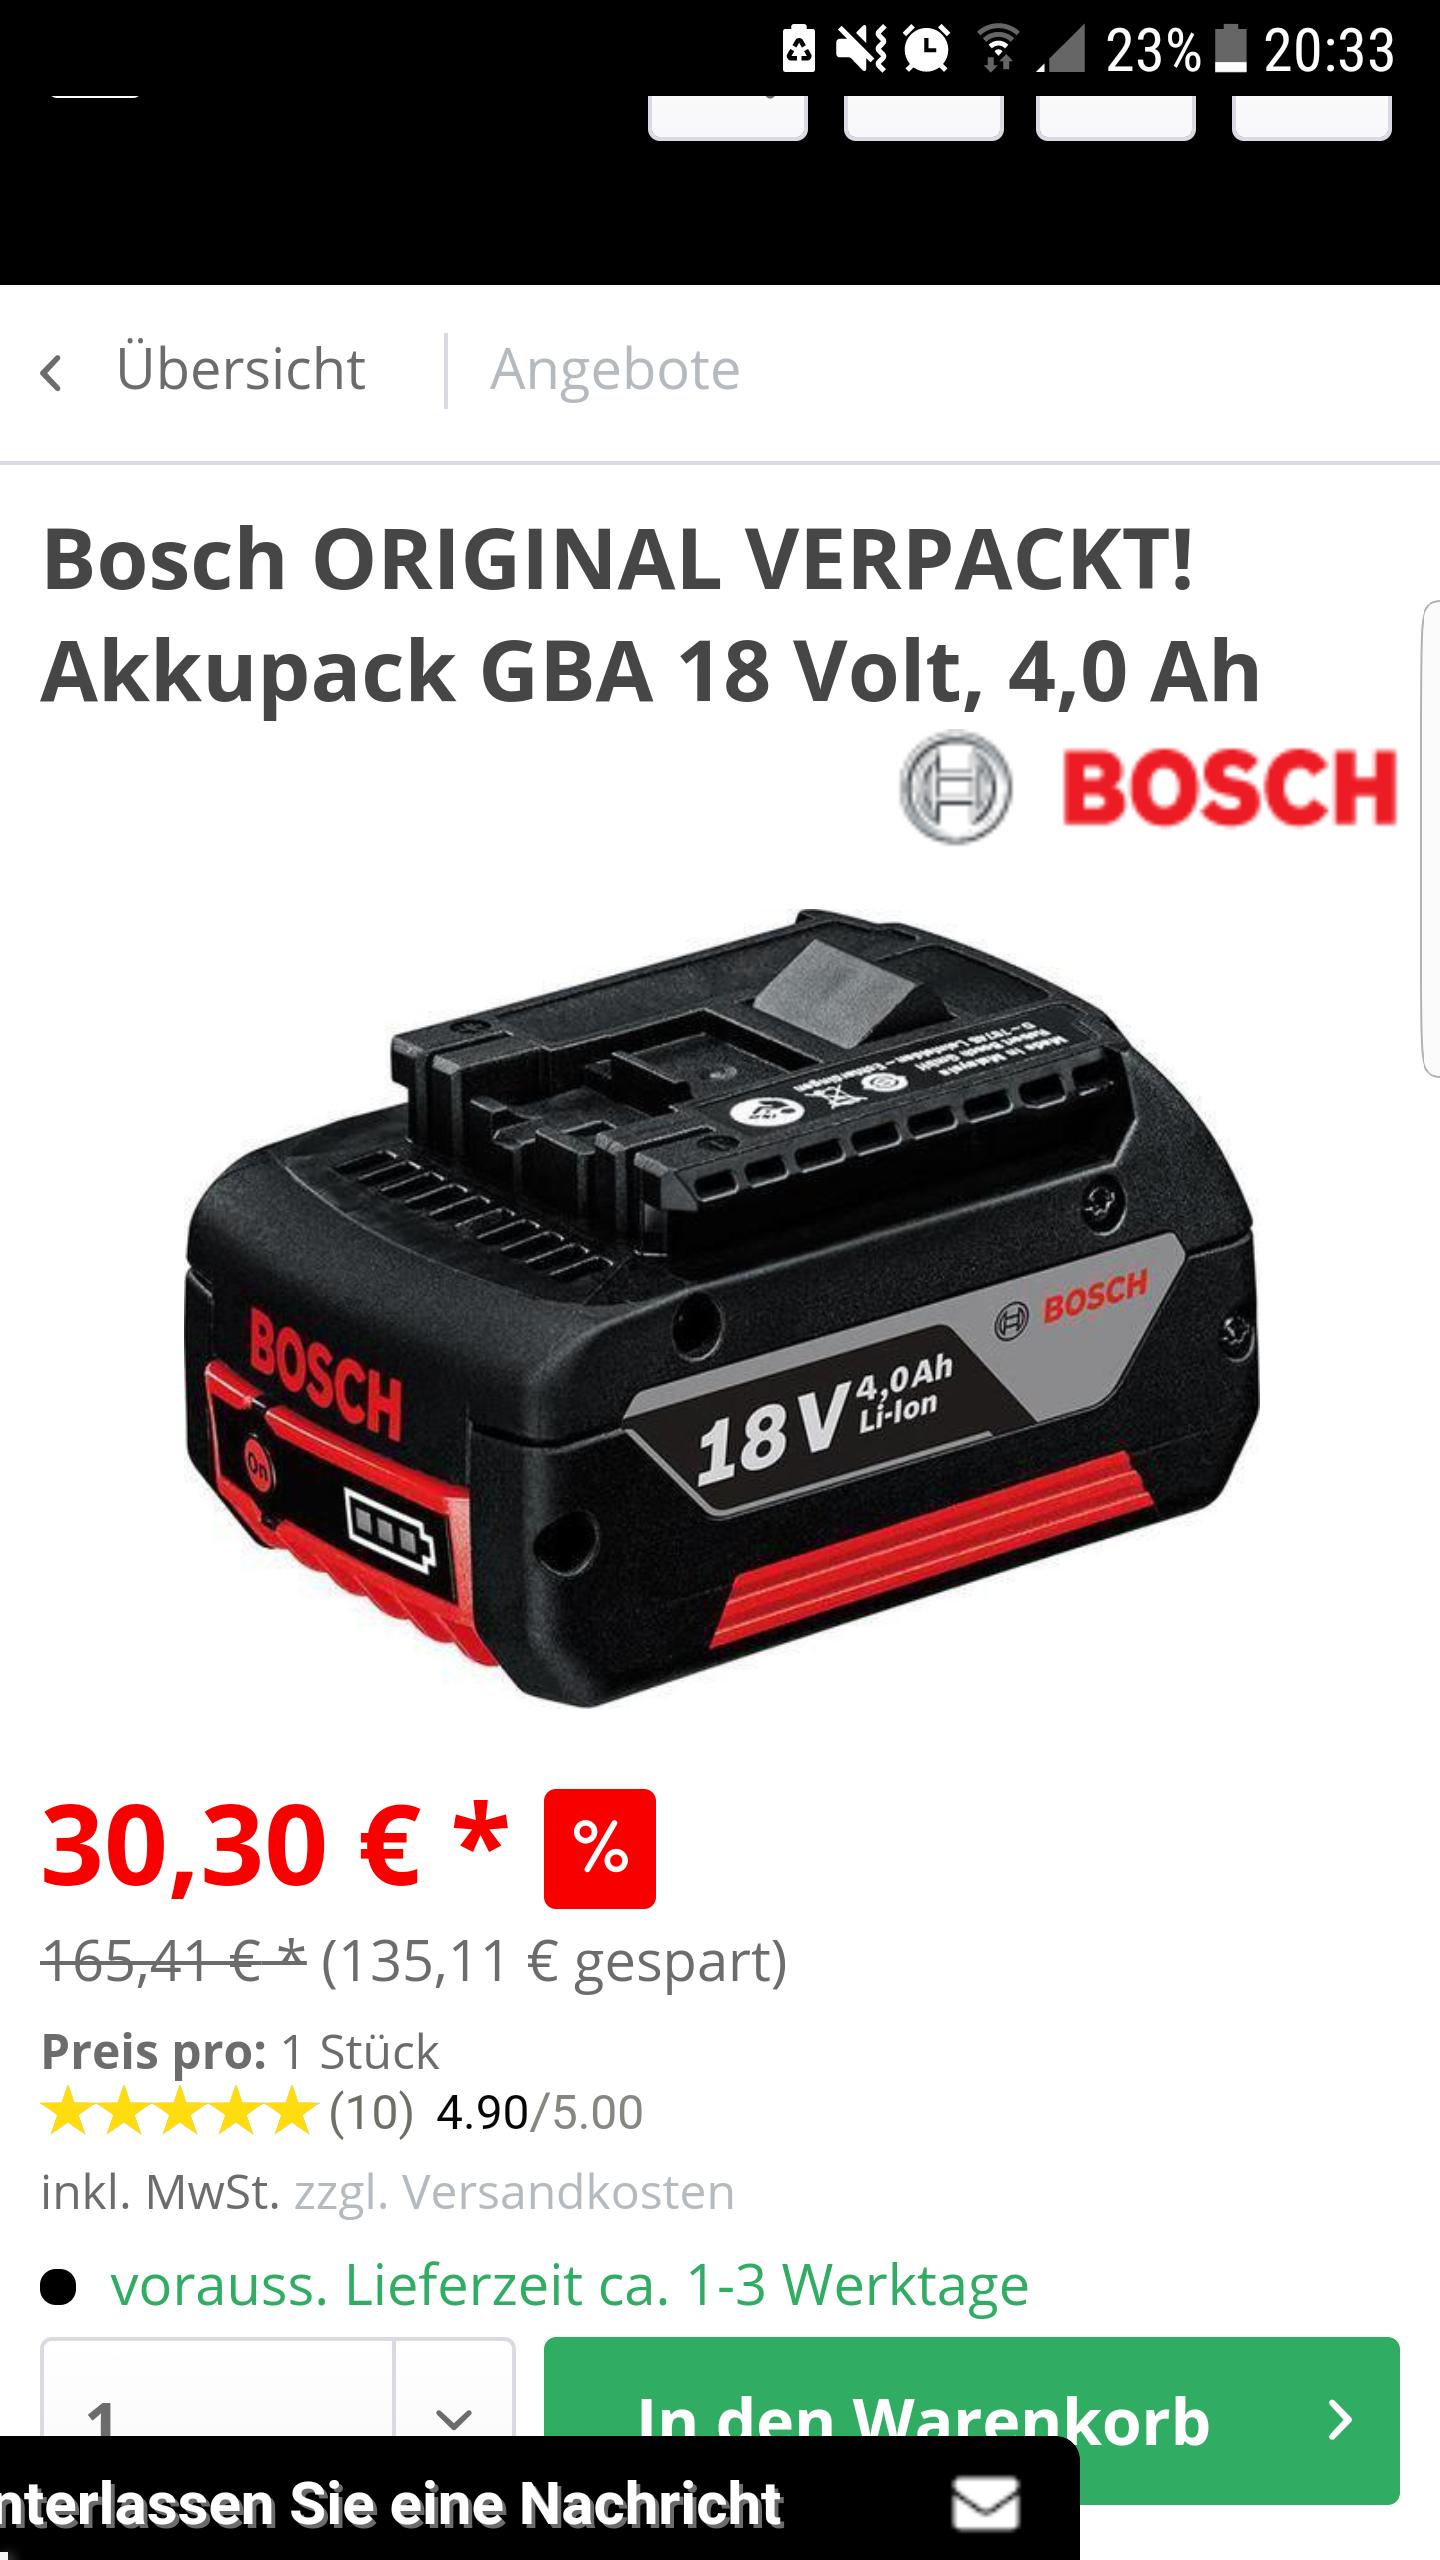 Bosch Akkupack 18v 4ah für 30,30 +Versand